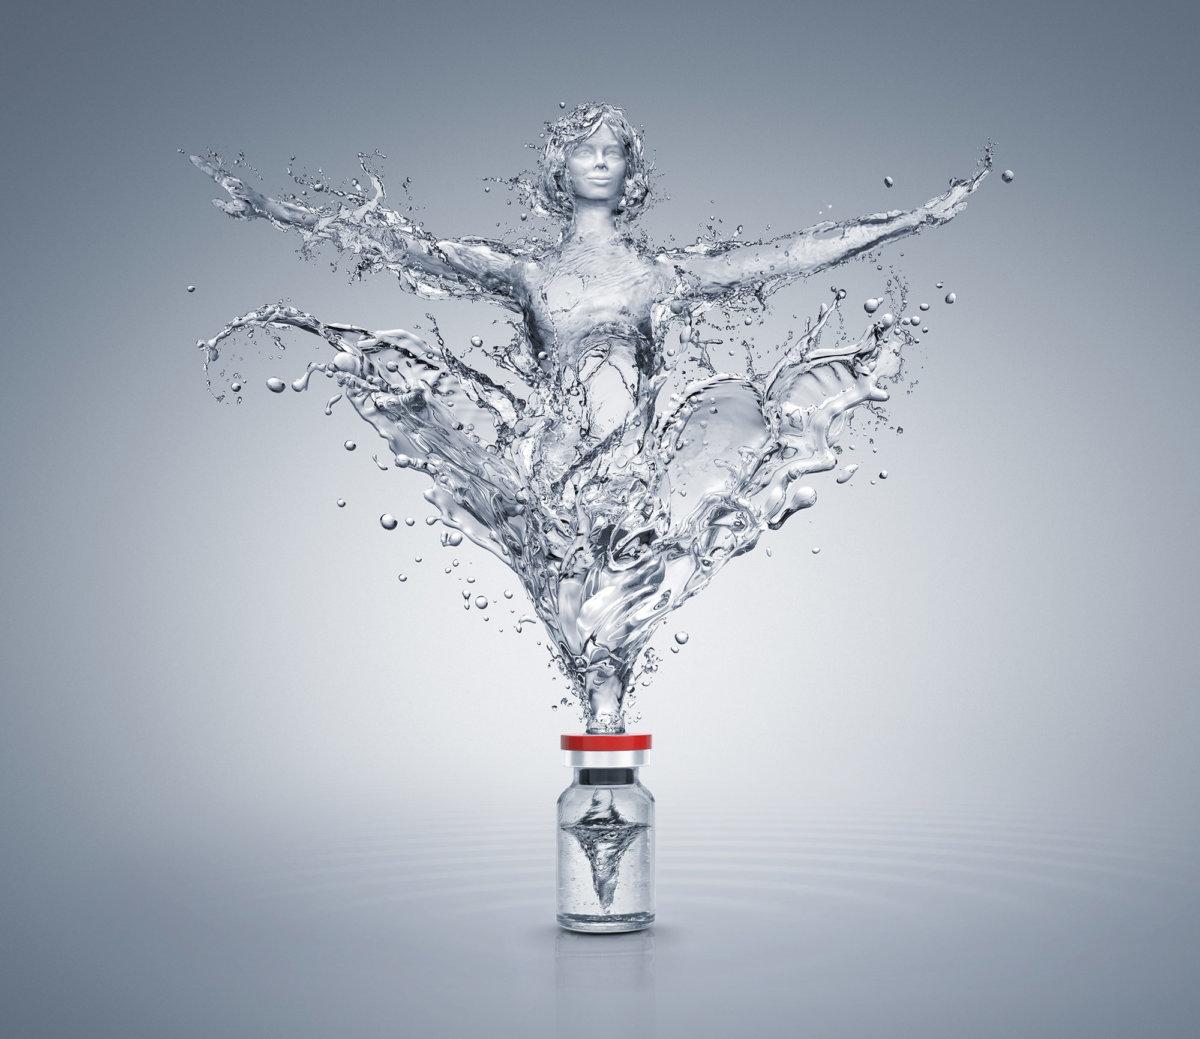 Liquid & Organic – Atomic14 - CRXSS